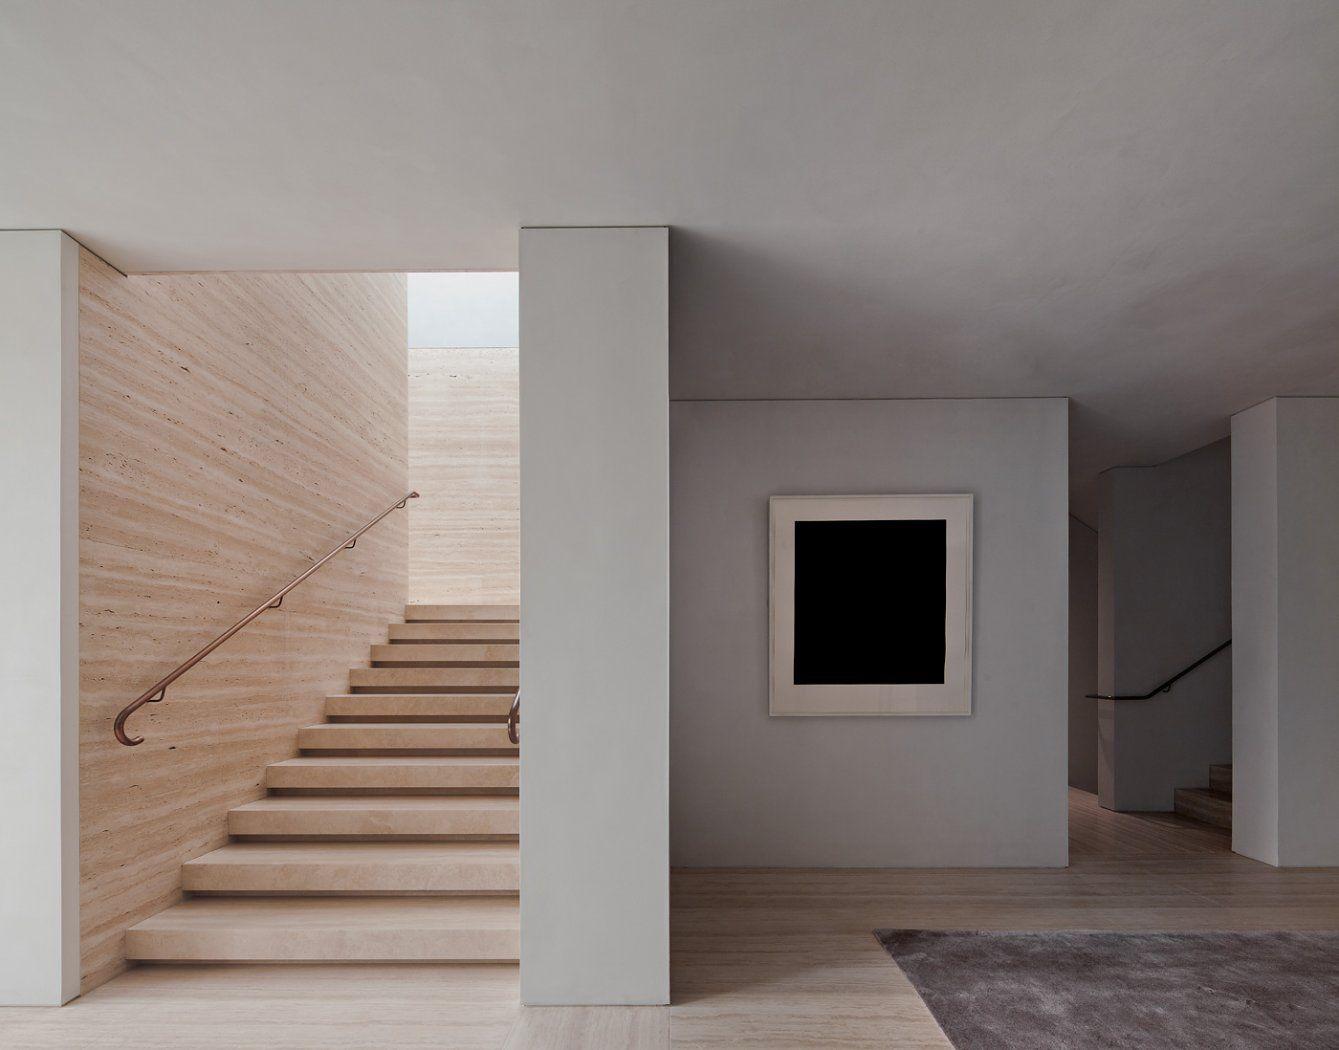 Modernes bungalow innenarchitektur wohnzimmer david chipperfield architects u private house kensington  places